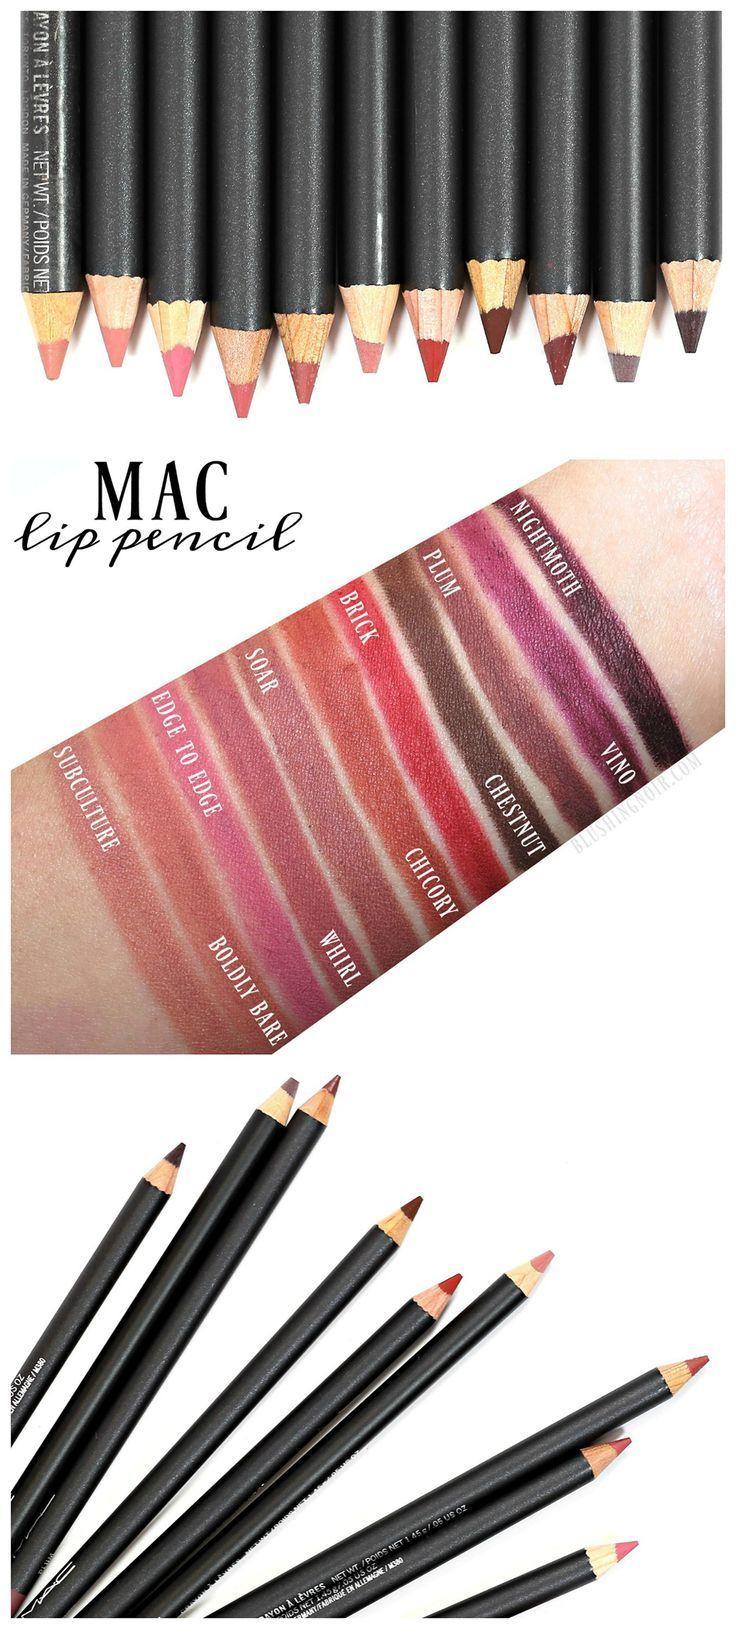 Lip Liner Wholesale Kylie Cosmetics: Best 25+ Mac Lips Ideas On Pinterest